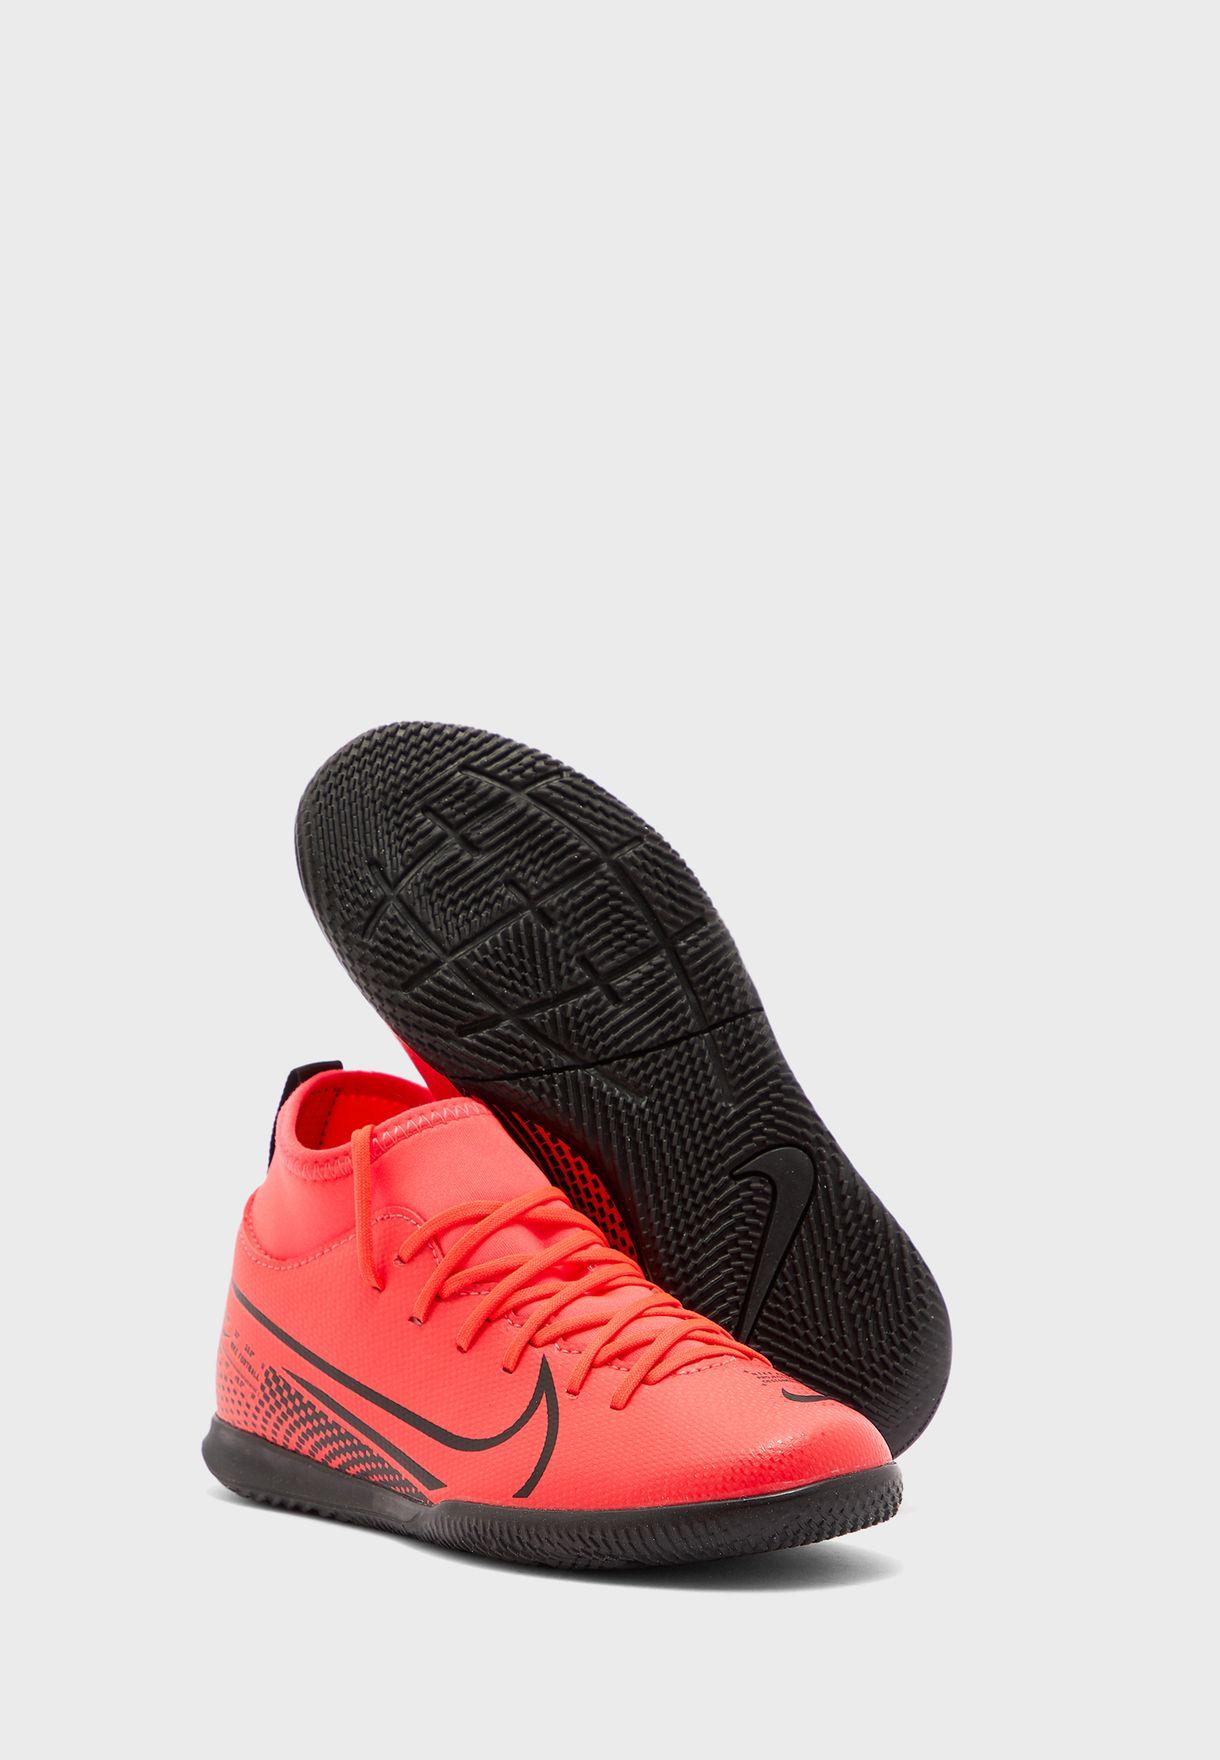 حذاء سوبر فلاي 7 كلوب